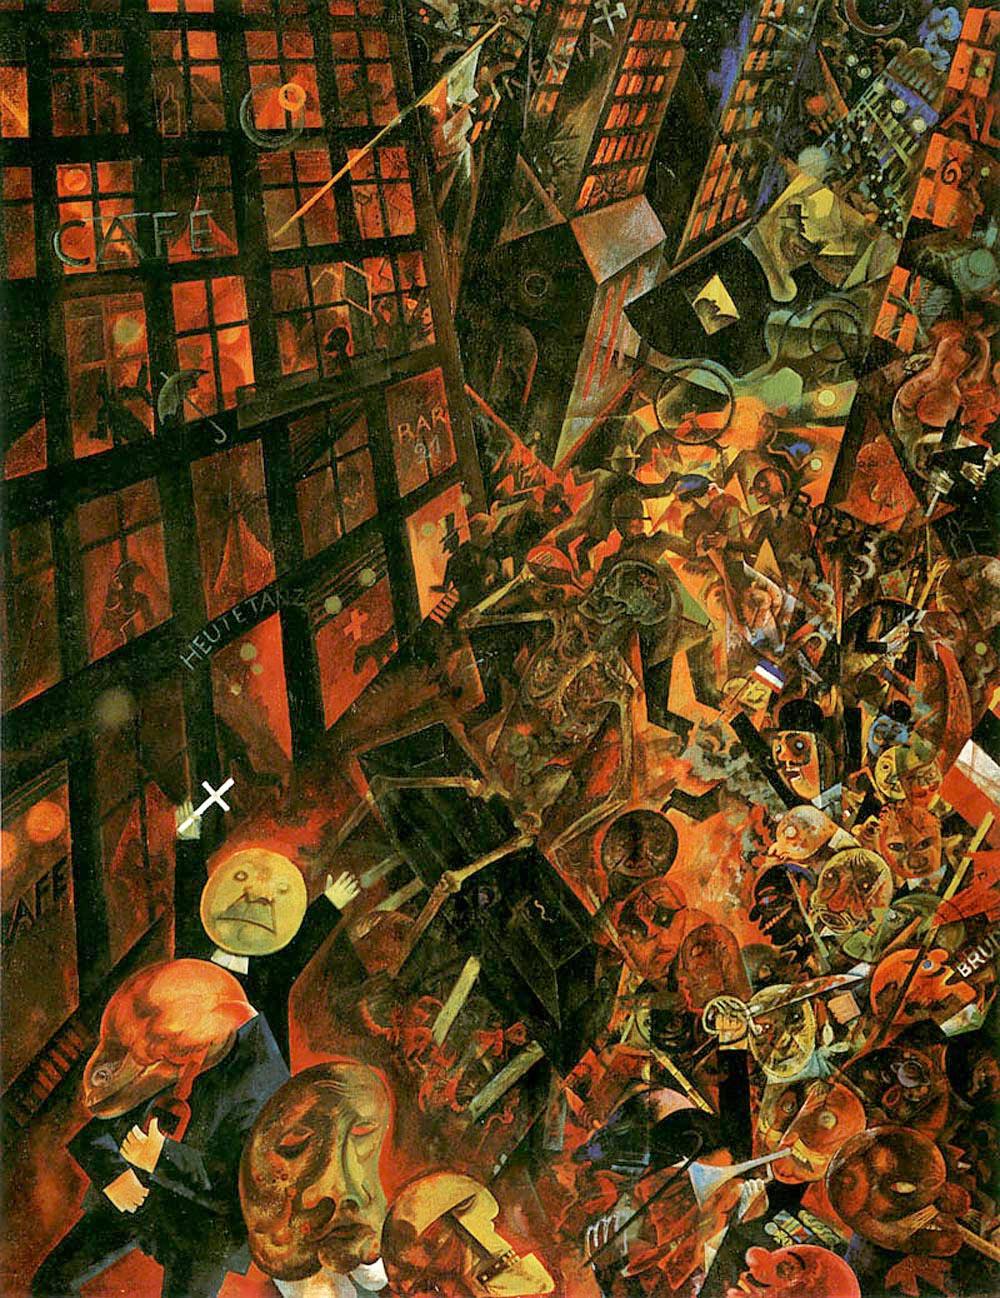 George Grosz. Exequias. Dedicado a Oskar Panizza, 1918.